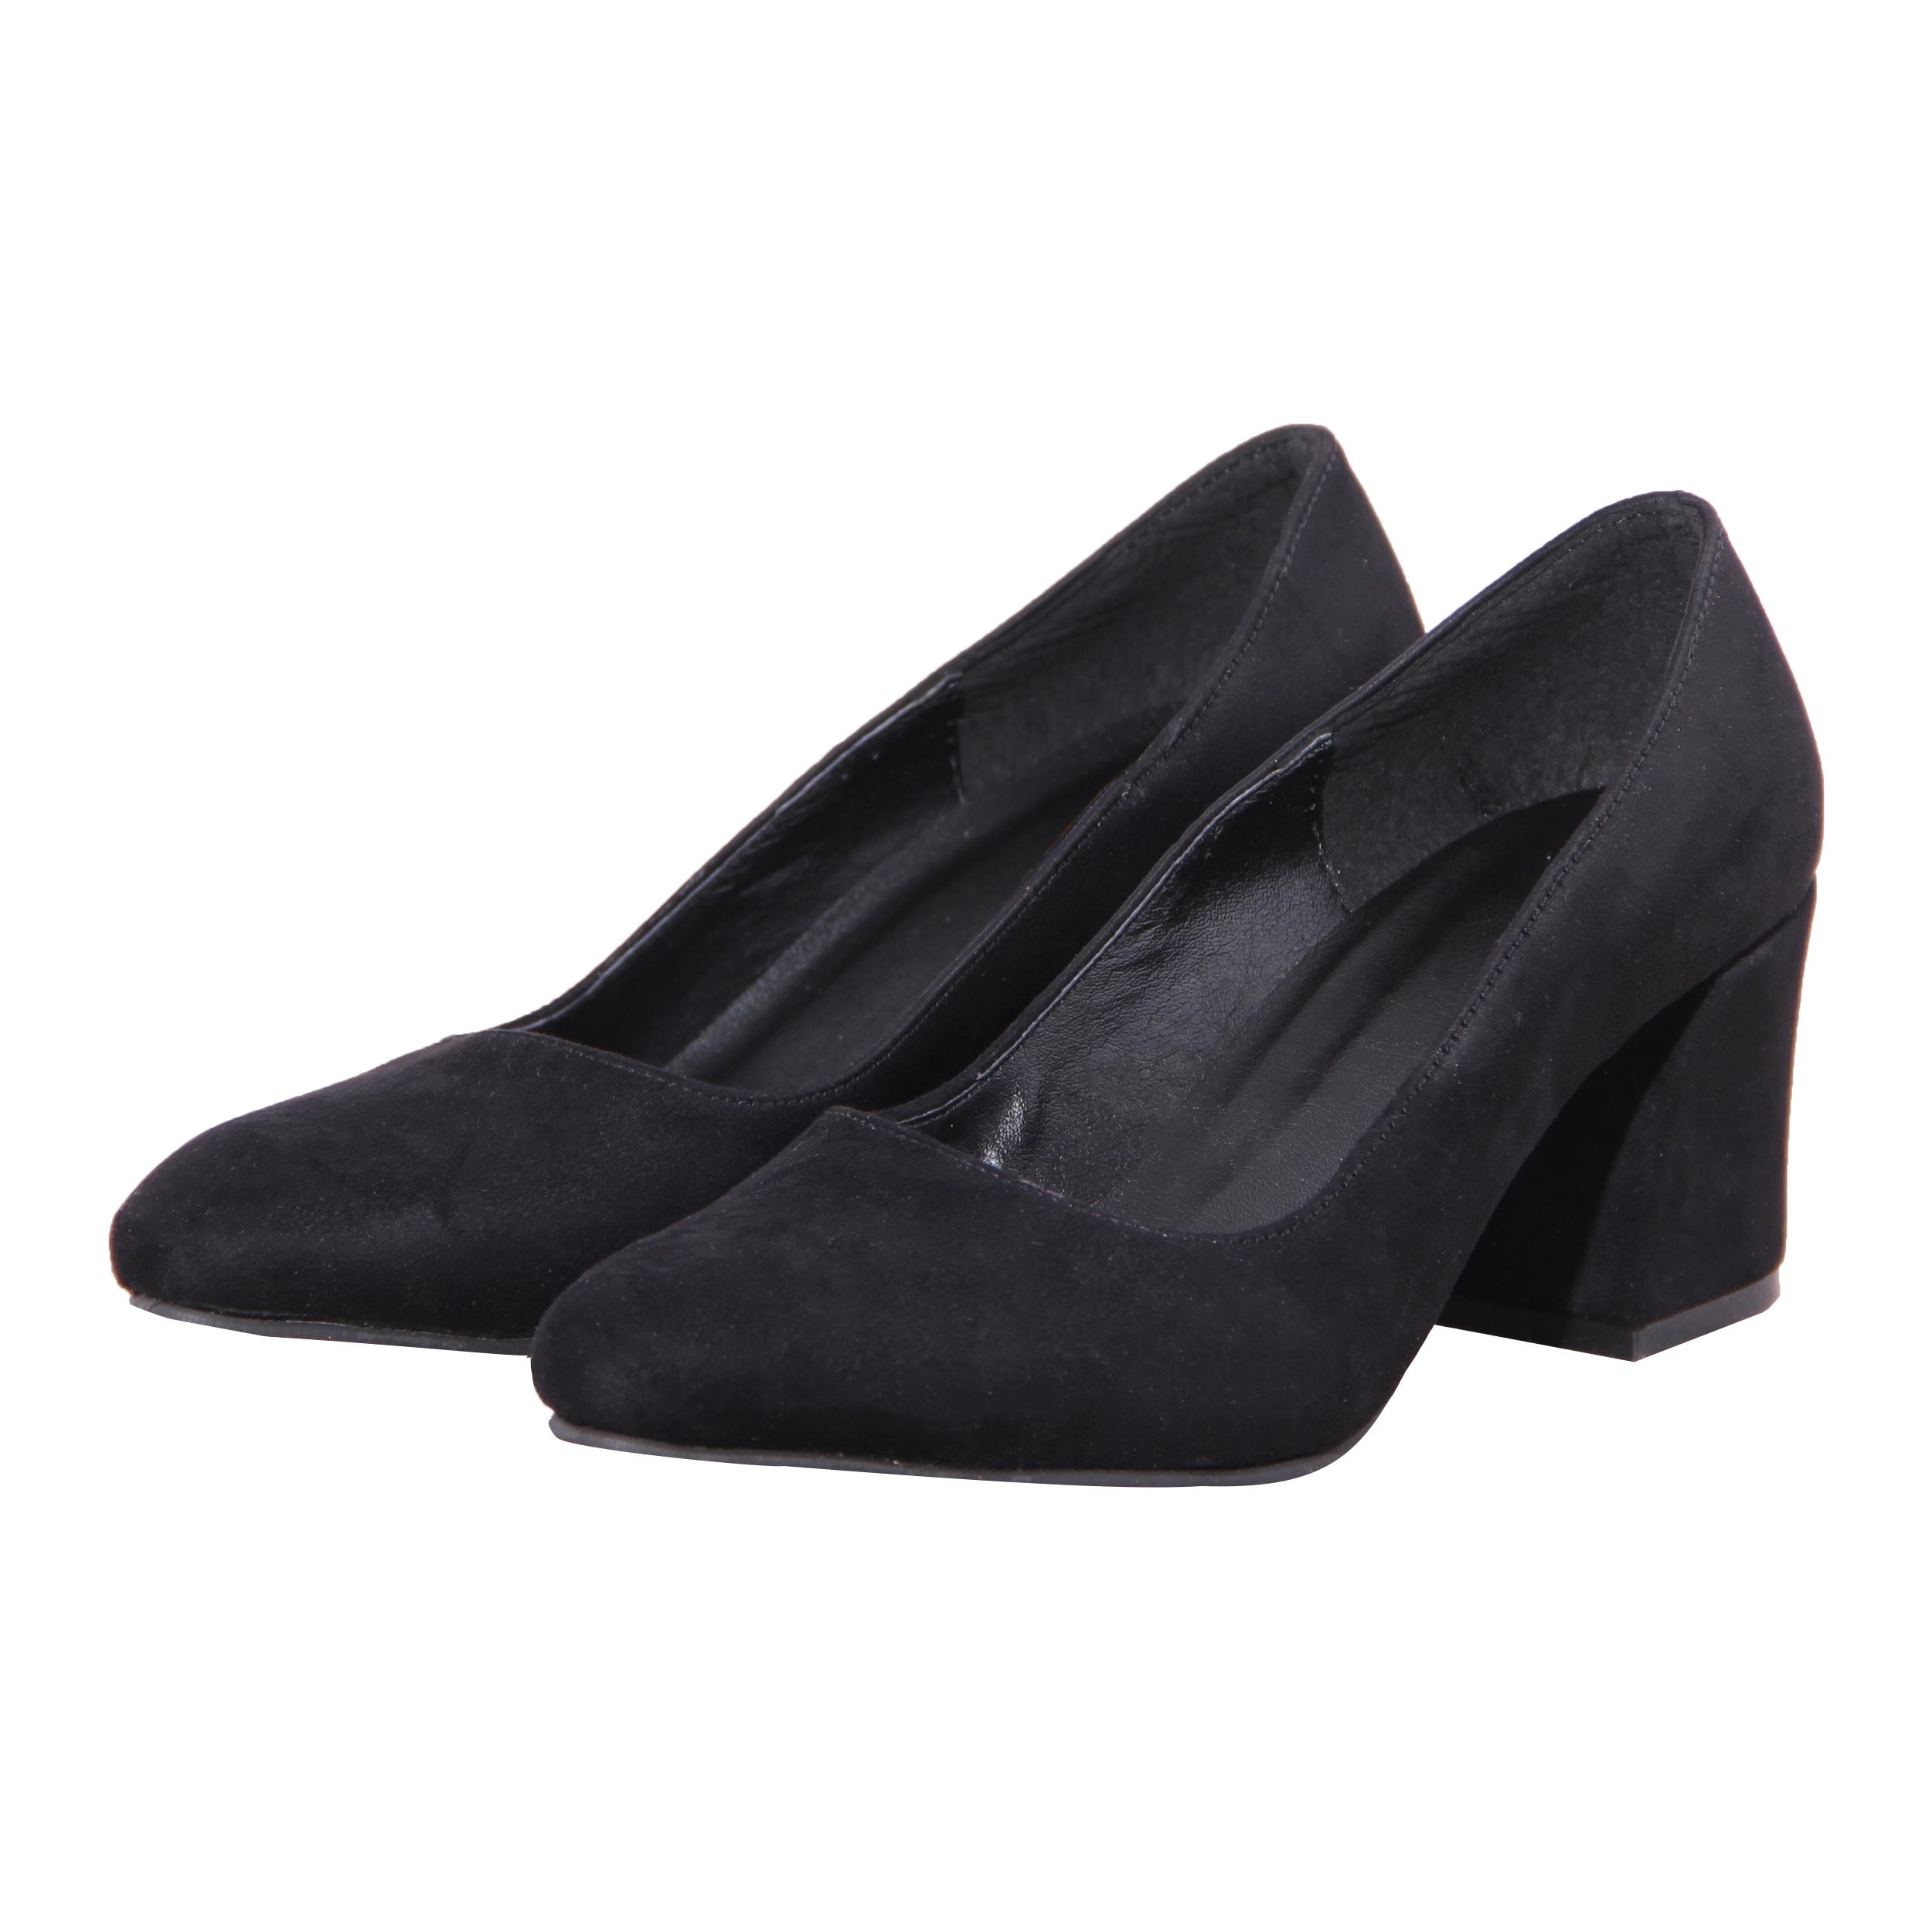 کفش زنانه کد 1-39953  main 1 4